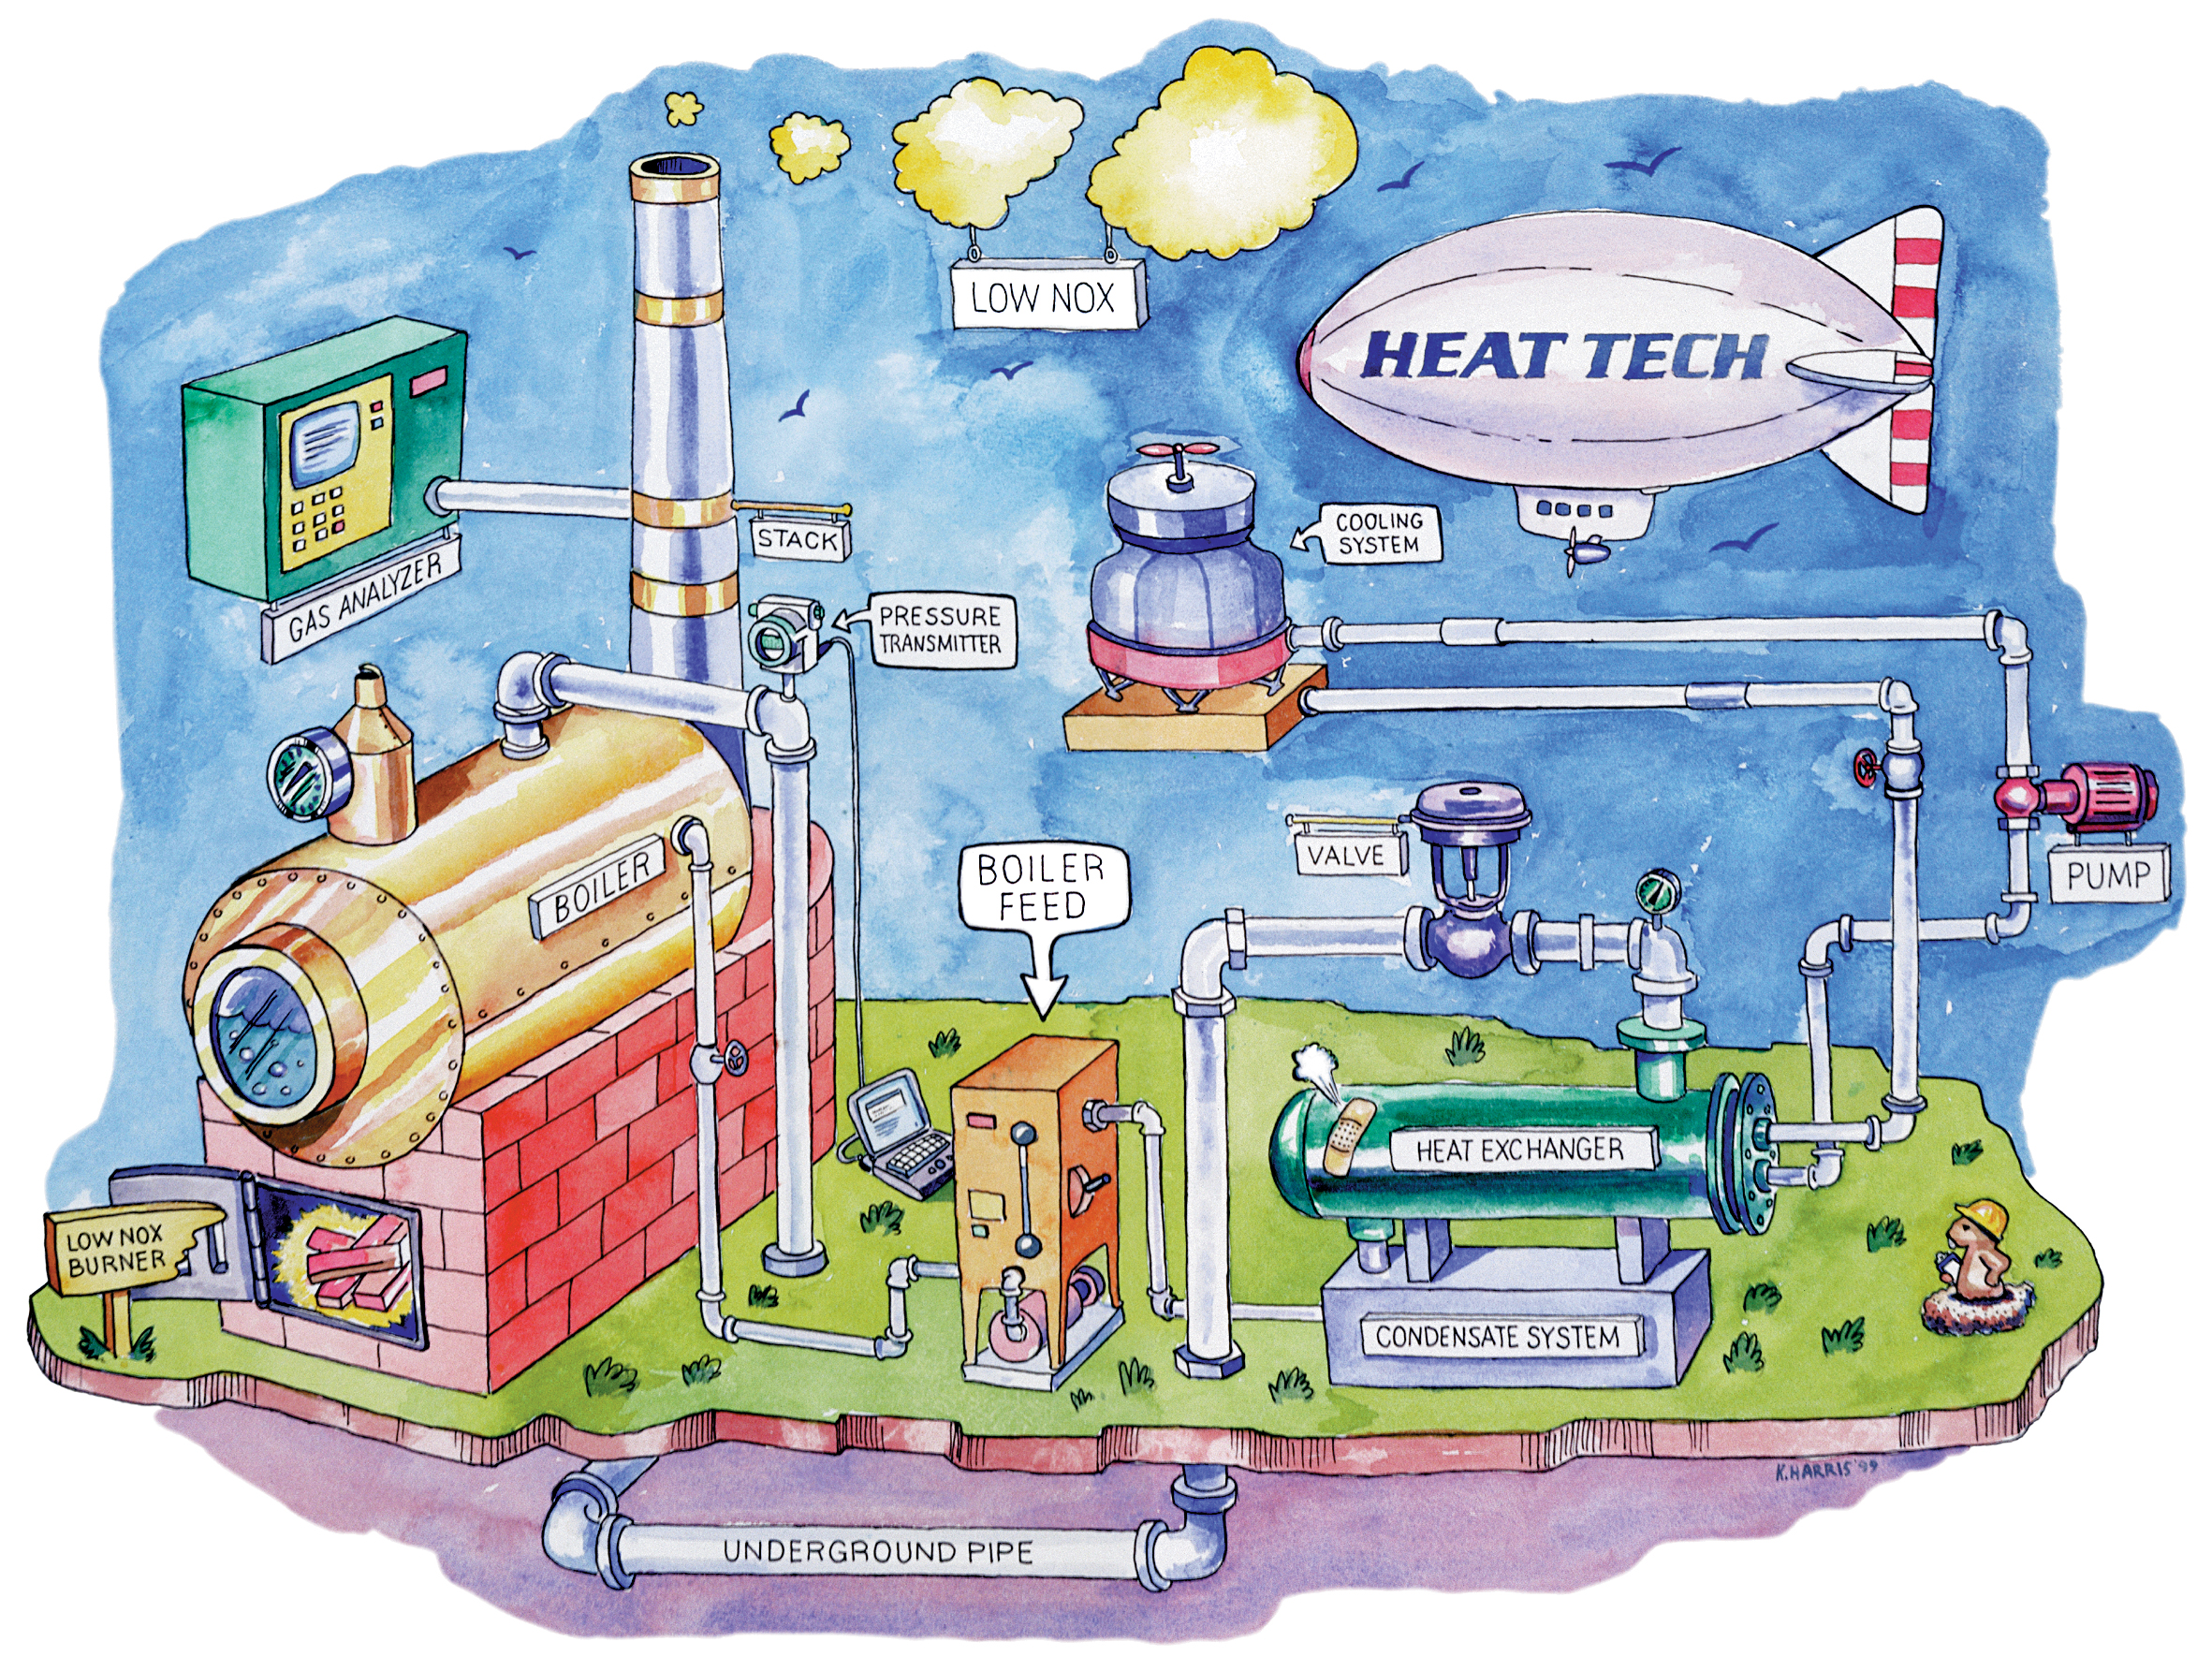 HeatTech Blimp.jpg